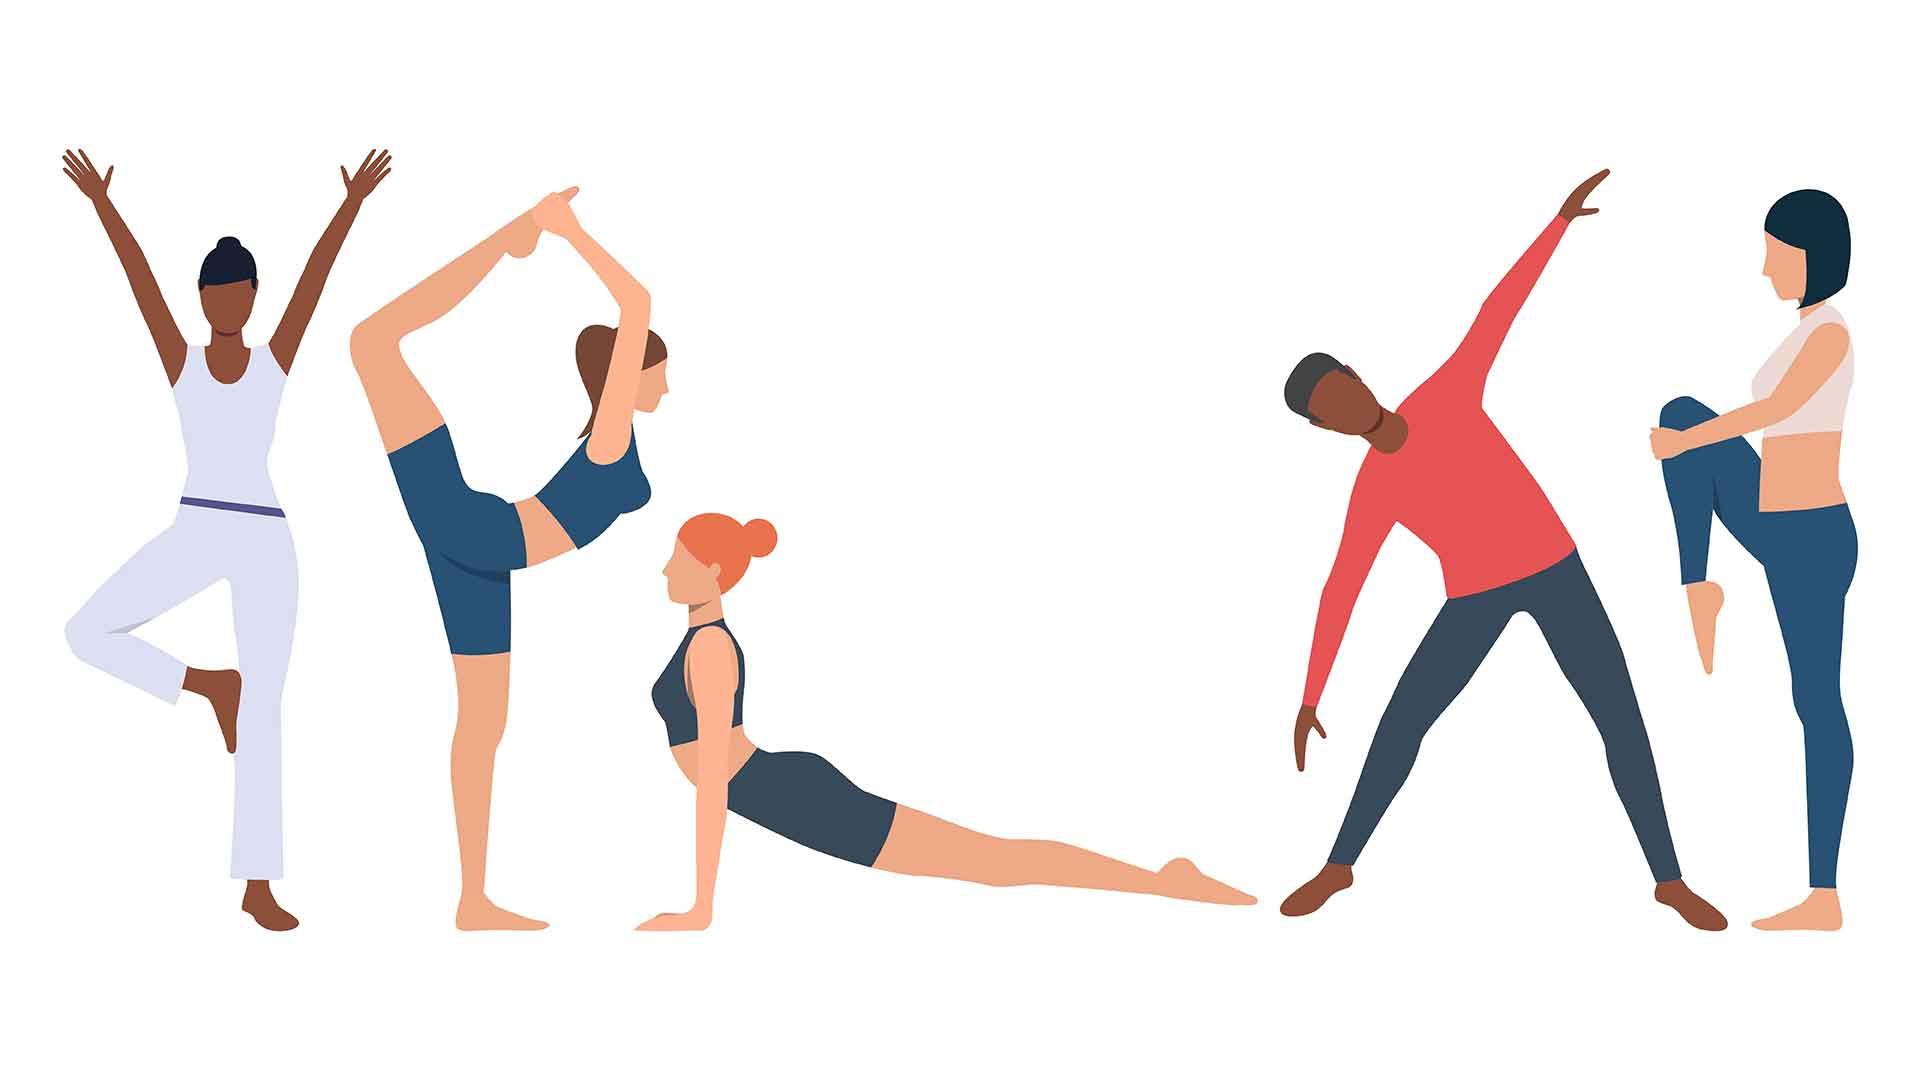 image relates to flexibility